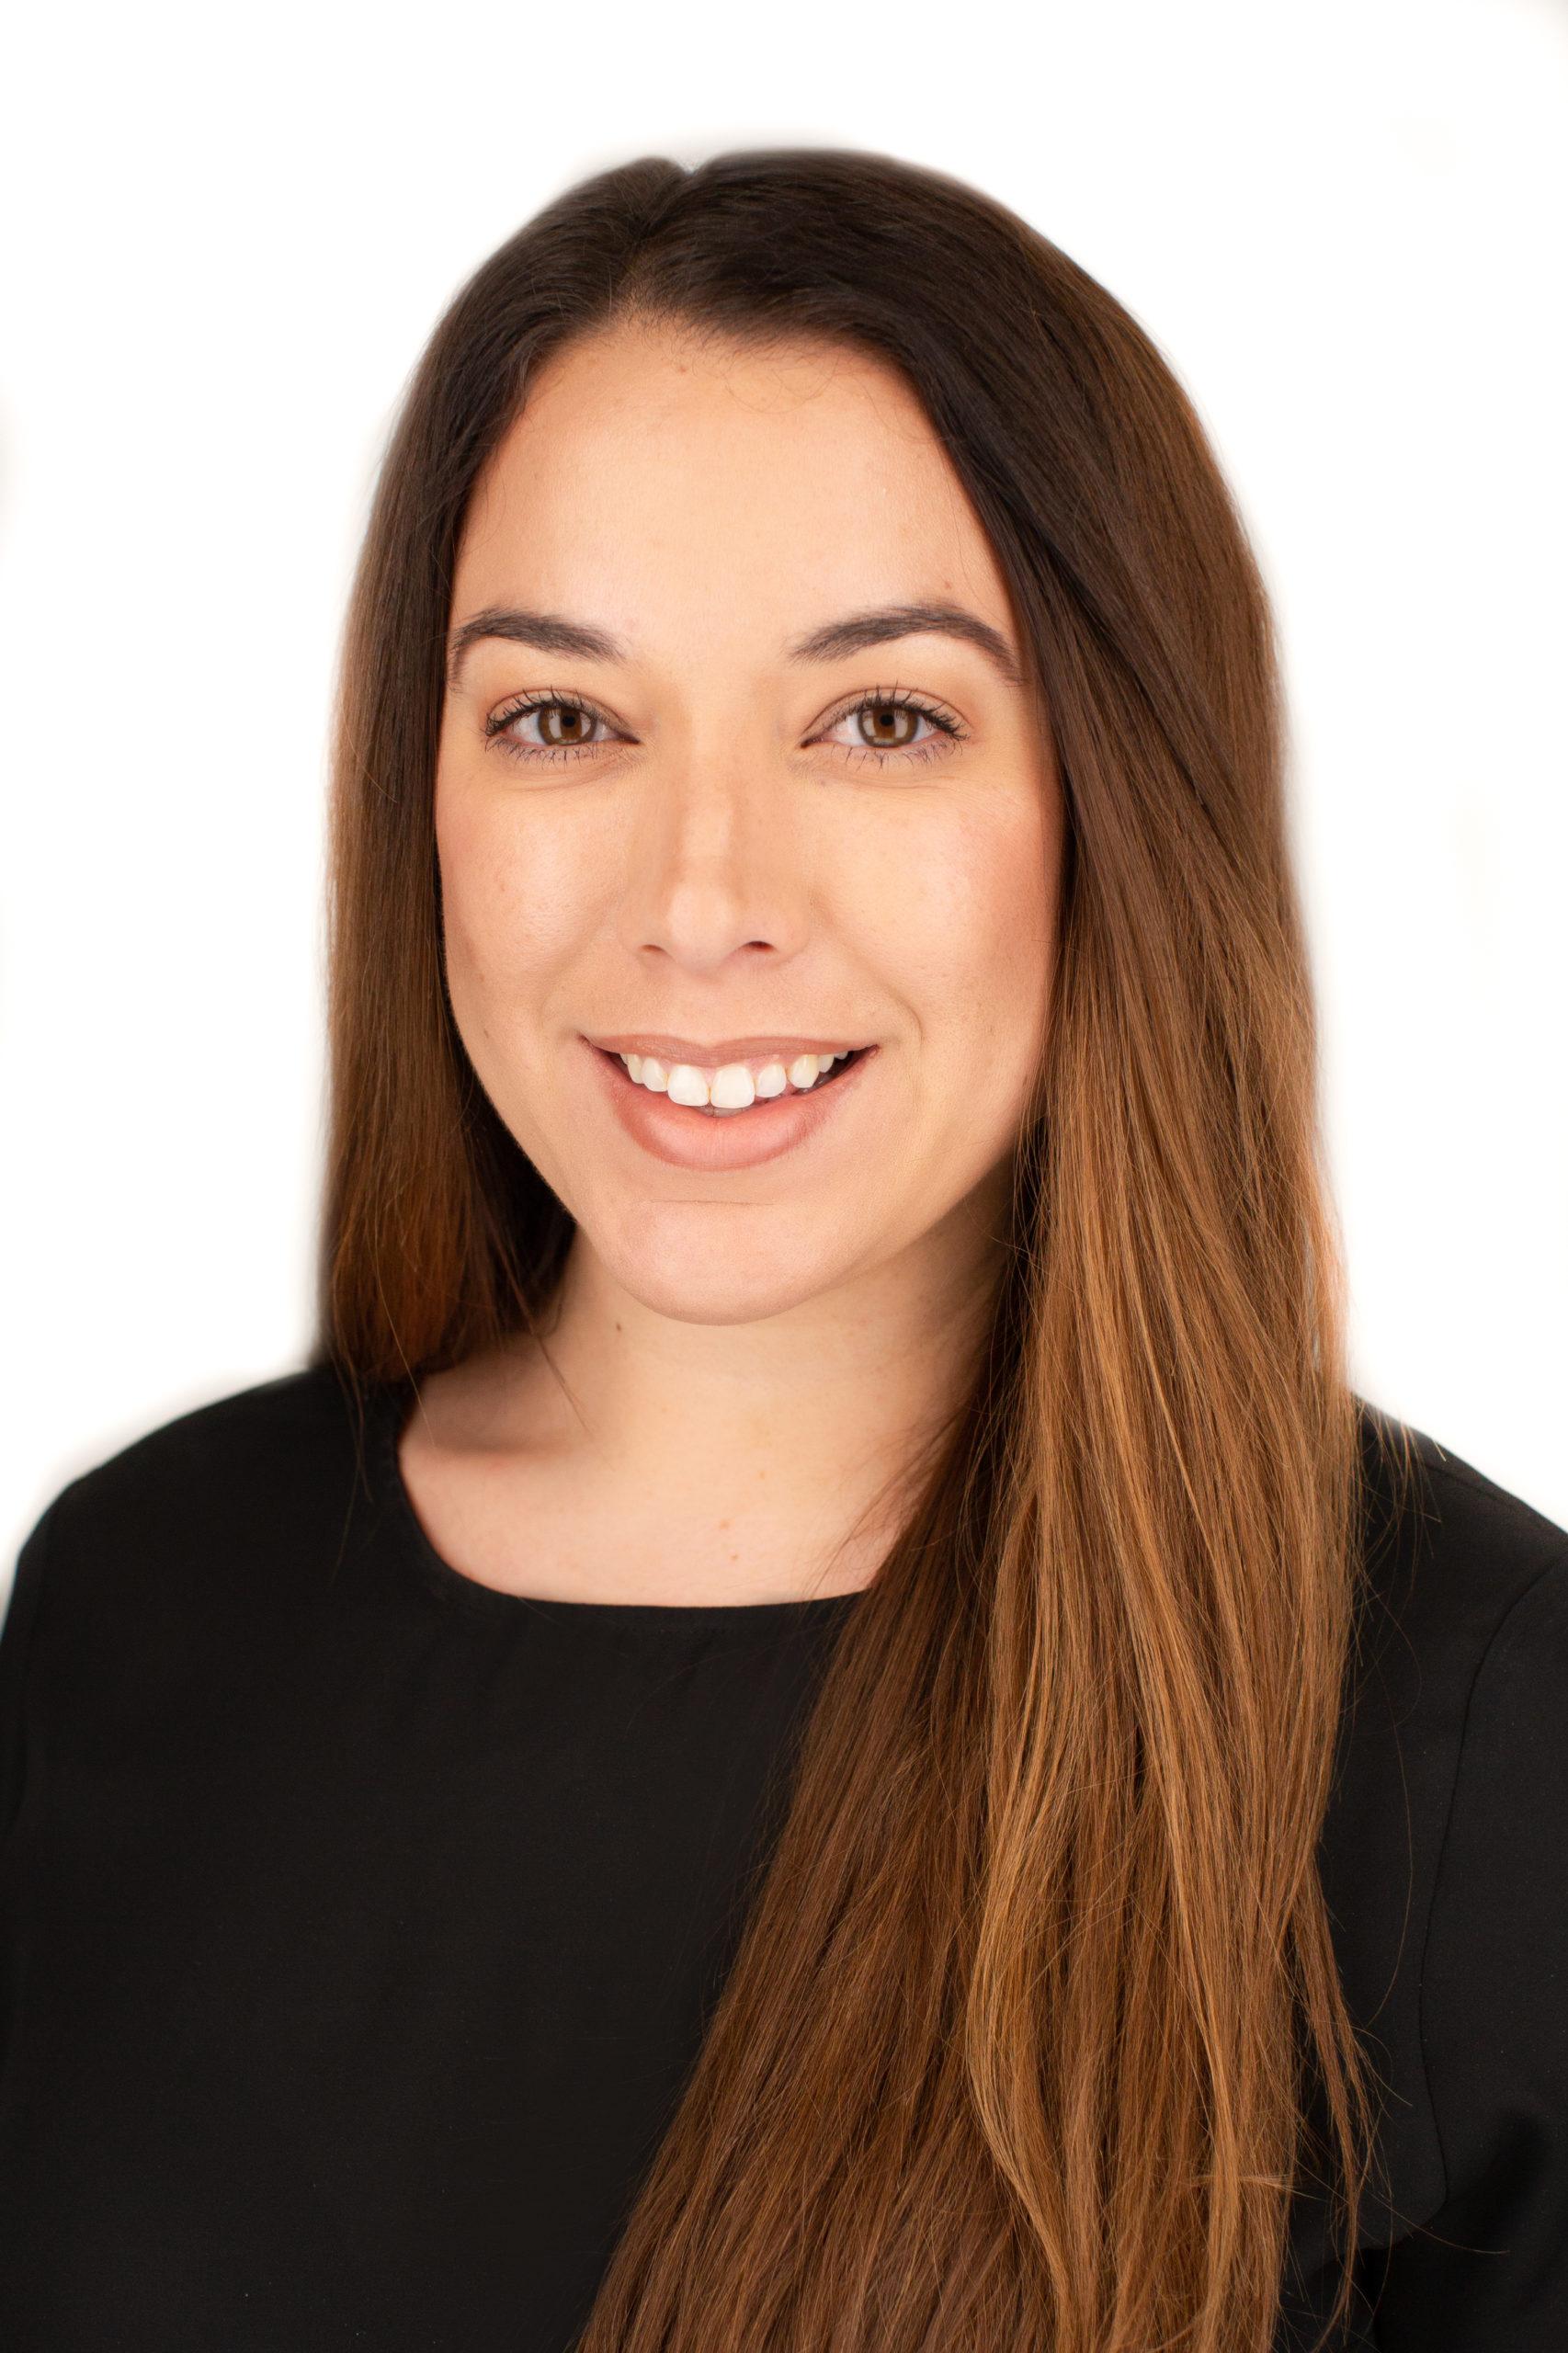 Megan Lewey